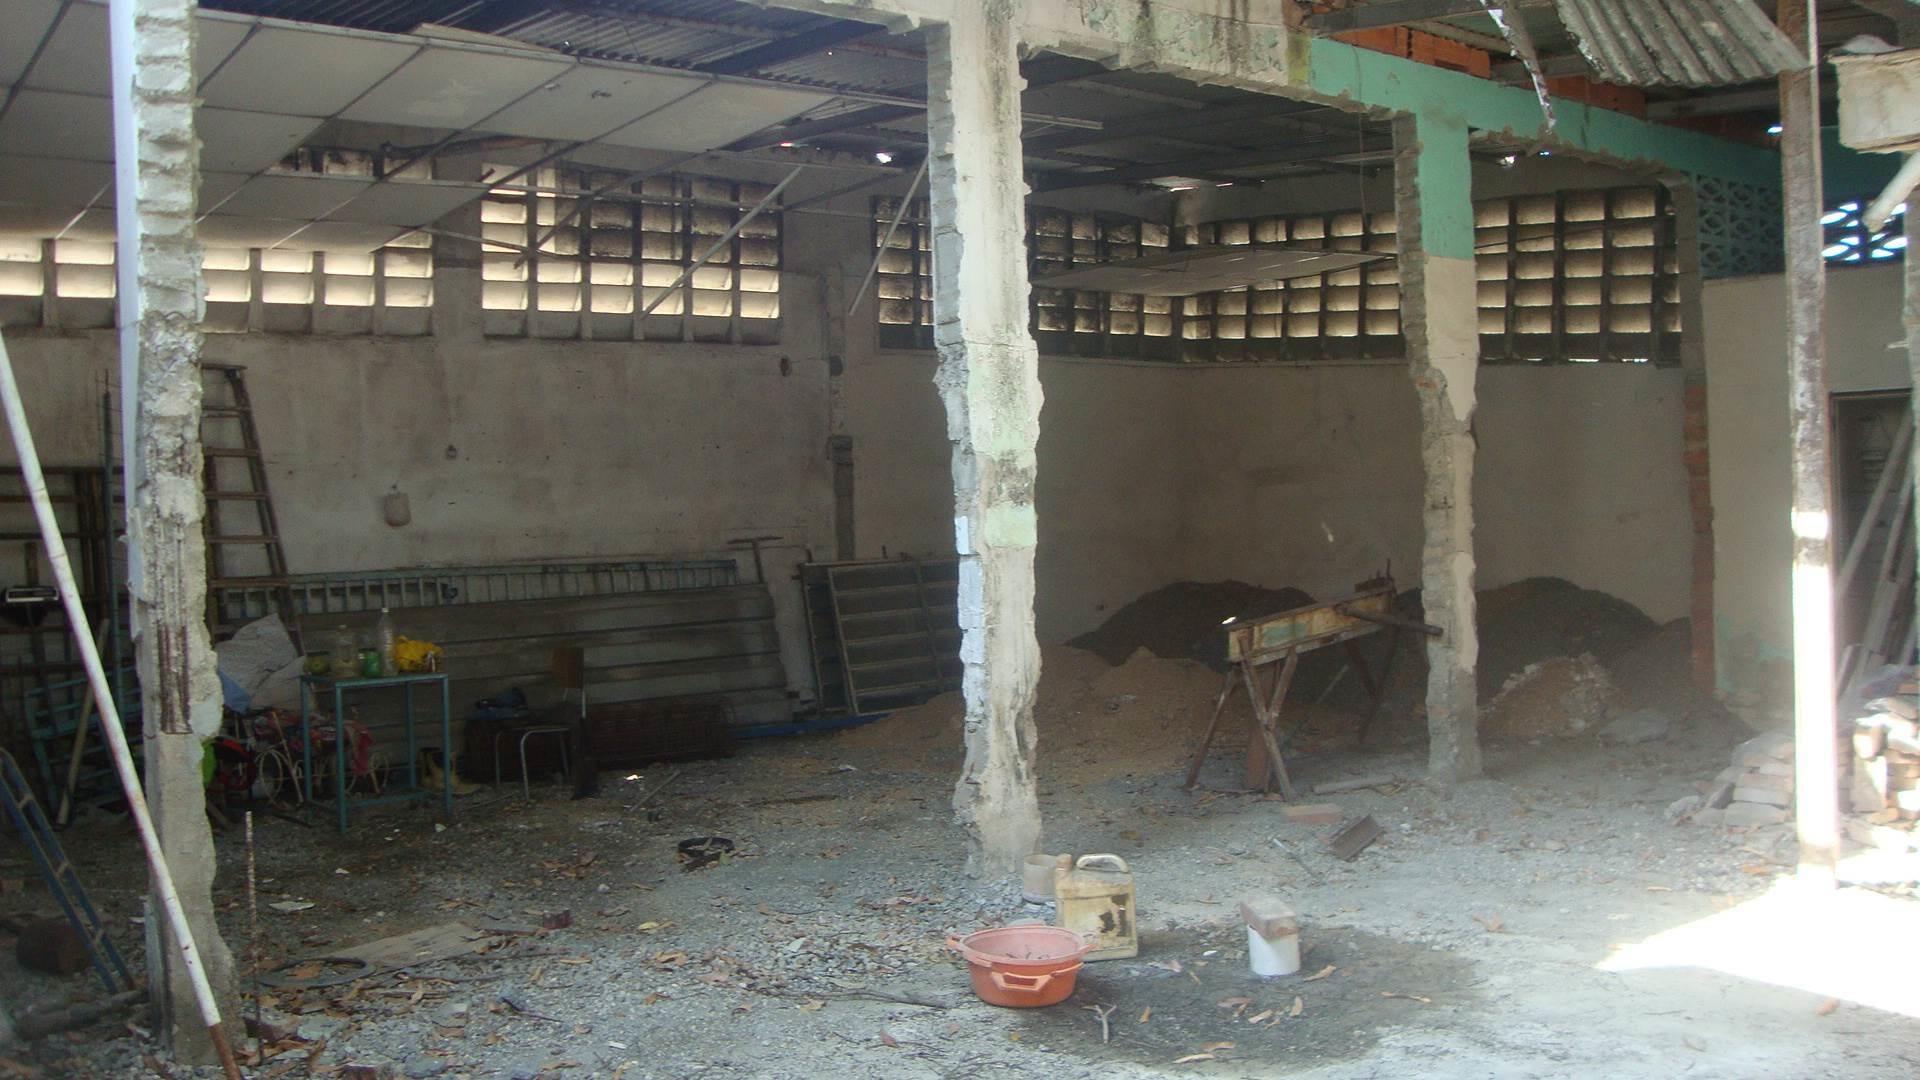 Local Comercial Lara>Barquisimeto>Centro - Venta:285.000 Precio Referencial - codigo: 19-1377